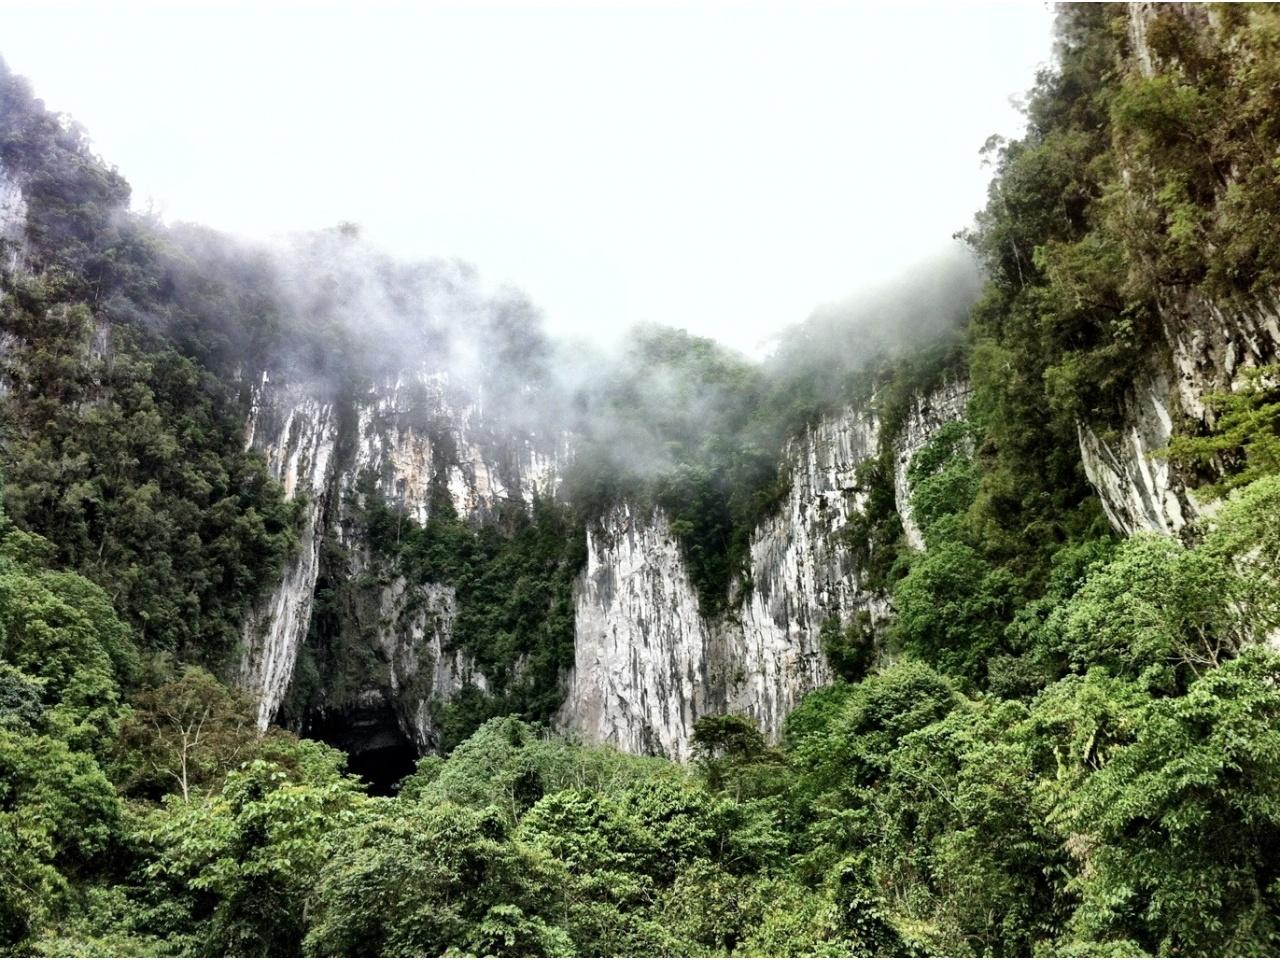 Formațiuni ciudate în Parcul Național Gunung Mulu din Malaezia